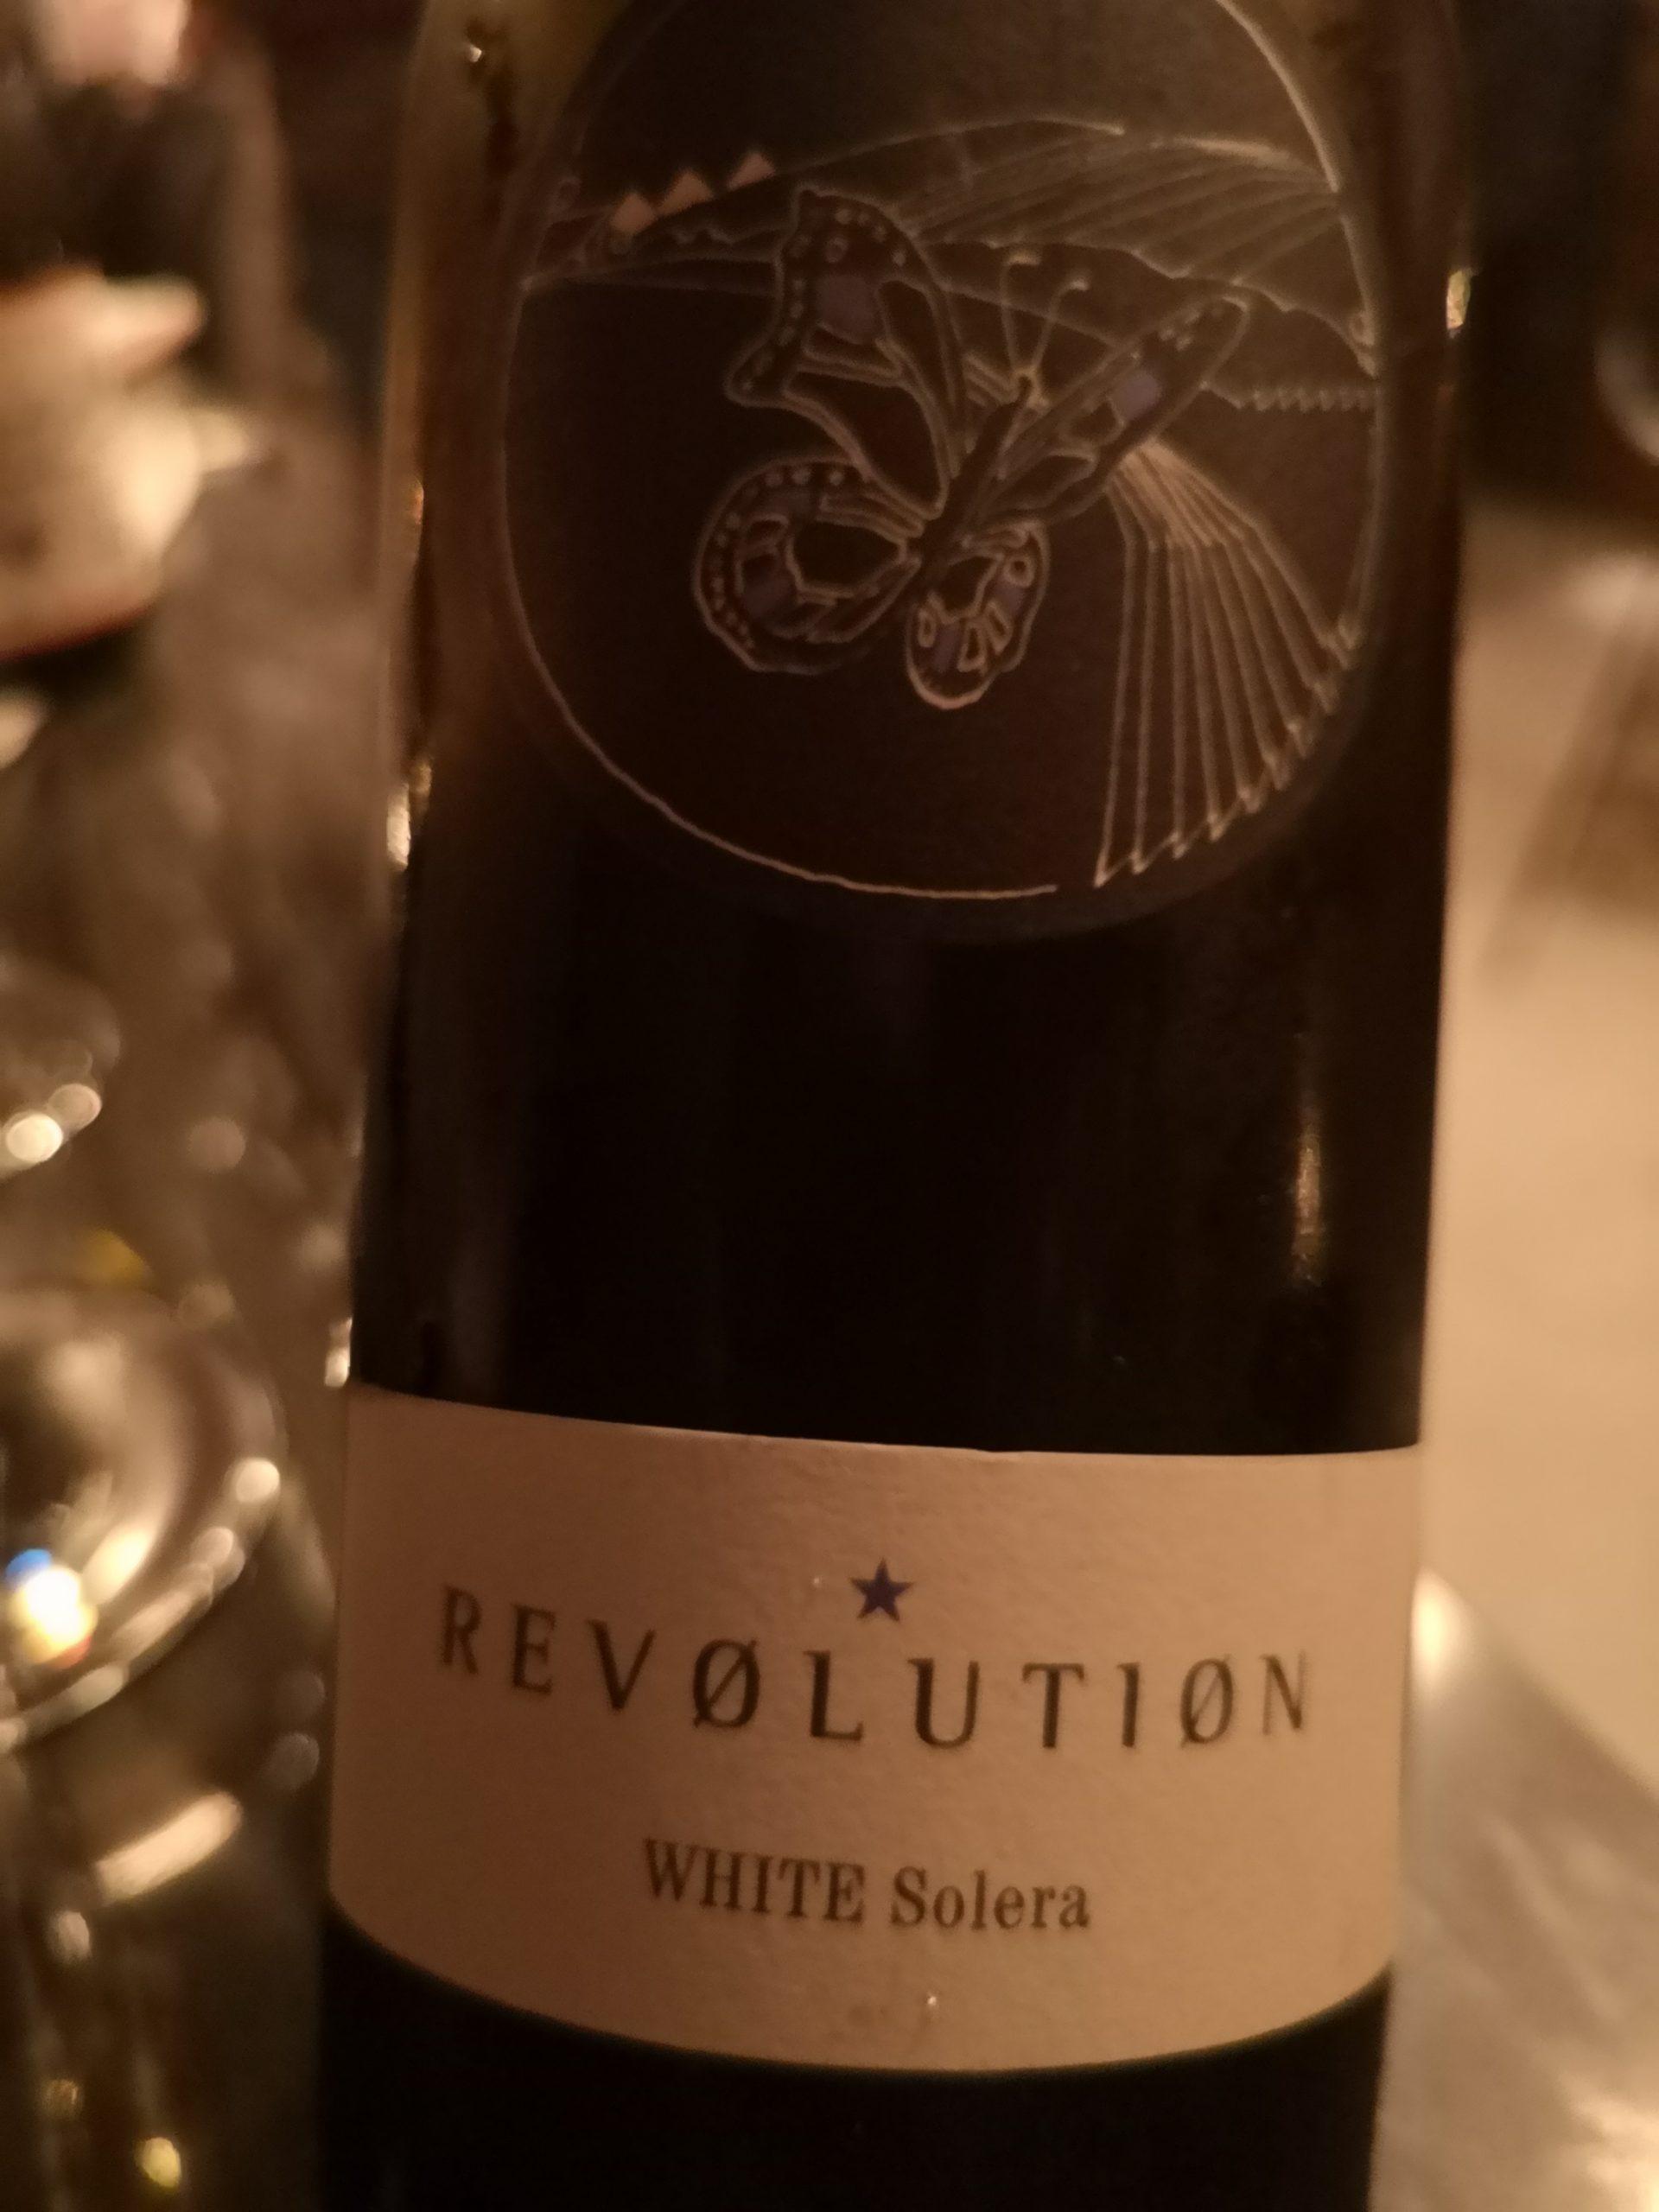 -nv- Revolution White Solera | Zillinger